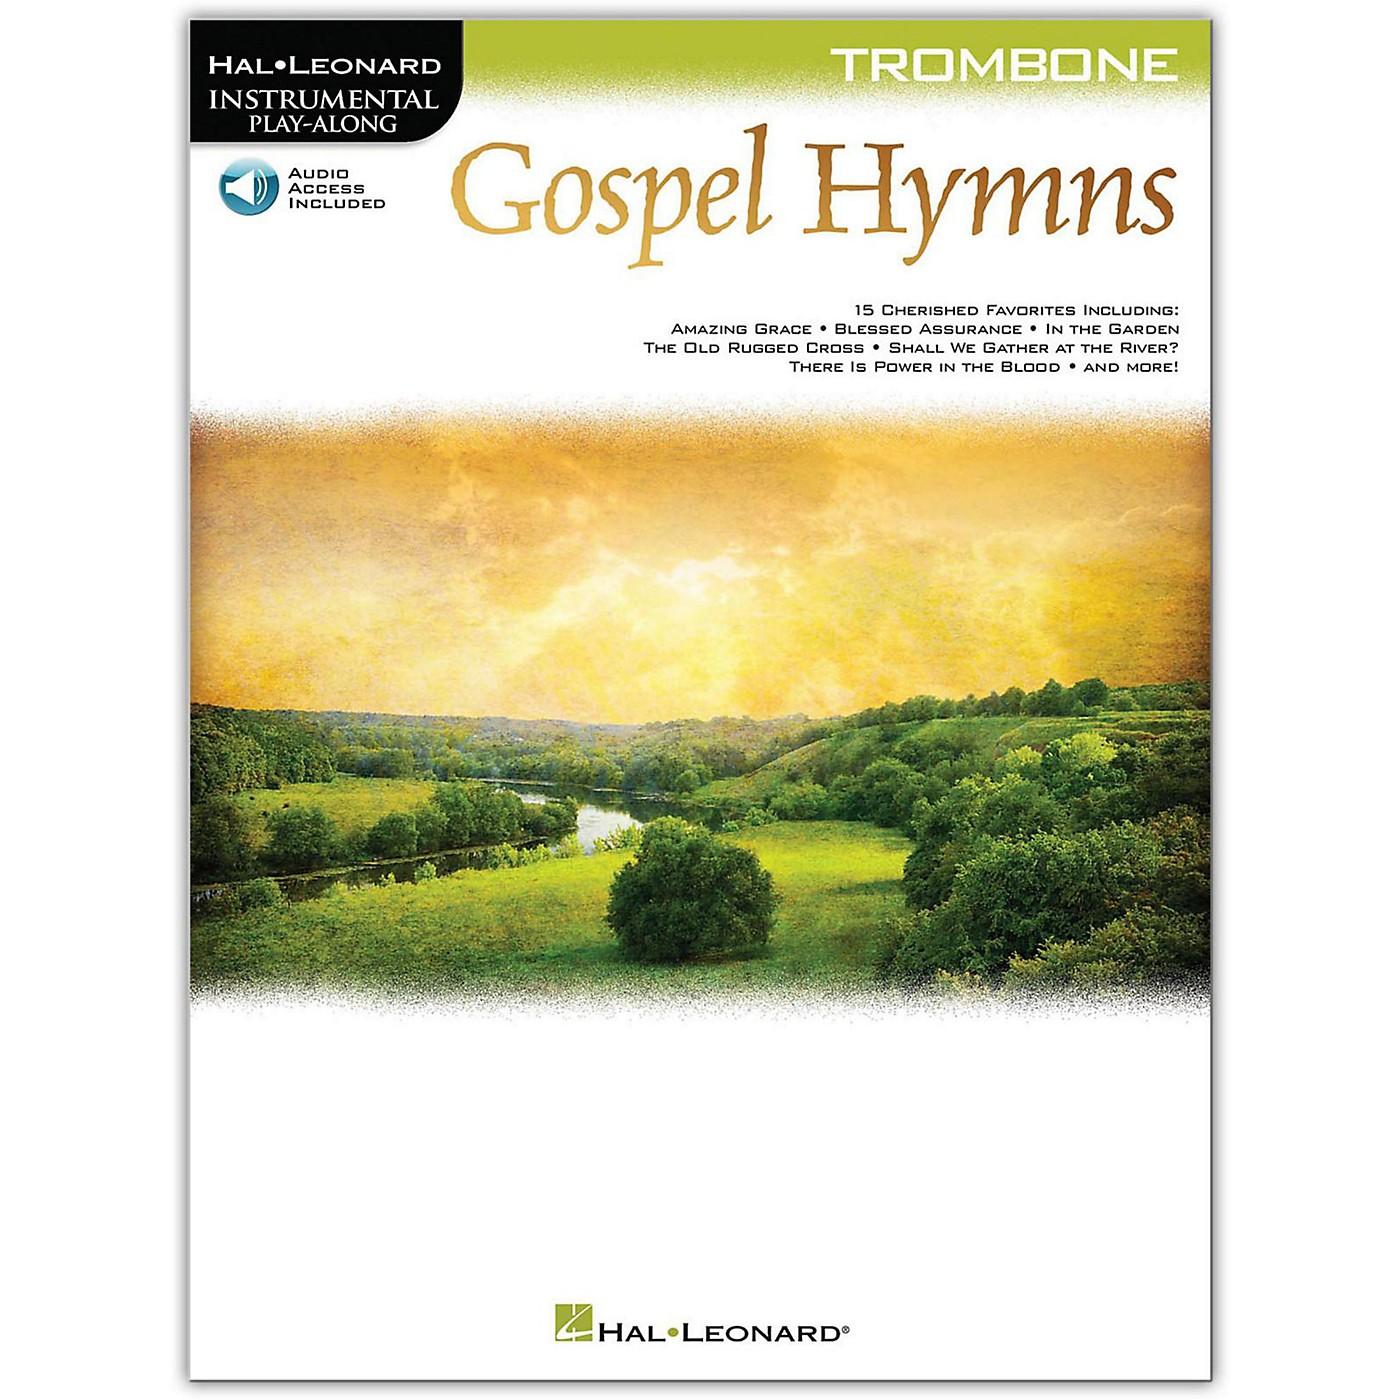 Hal Leonard Gospel Hymns For Trombone Instrumental Play-Along Book/Audio Online thumbnail